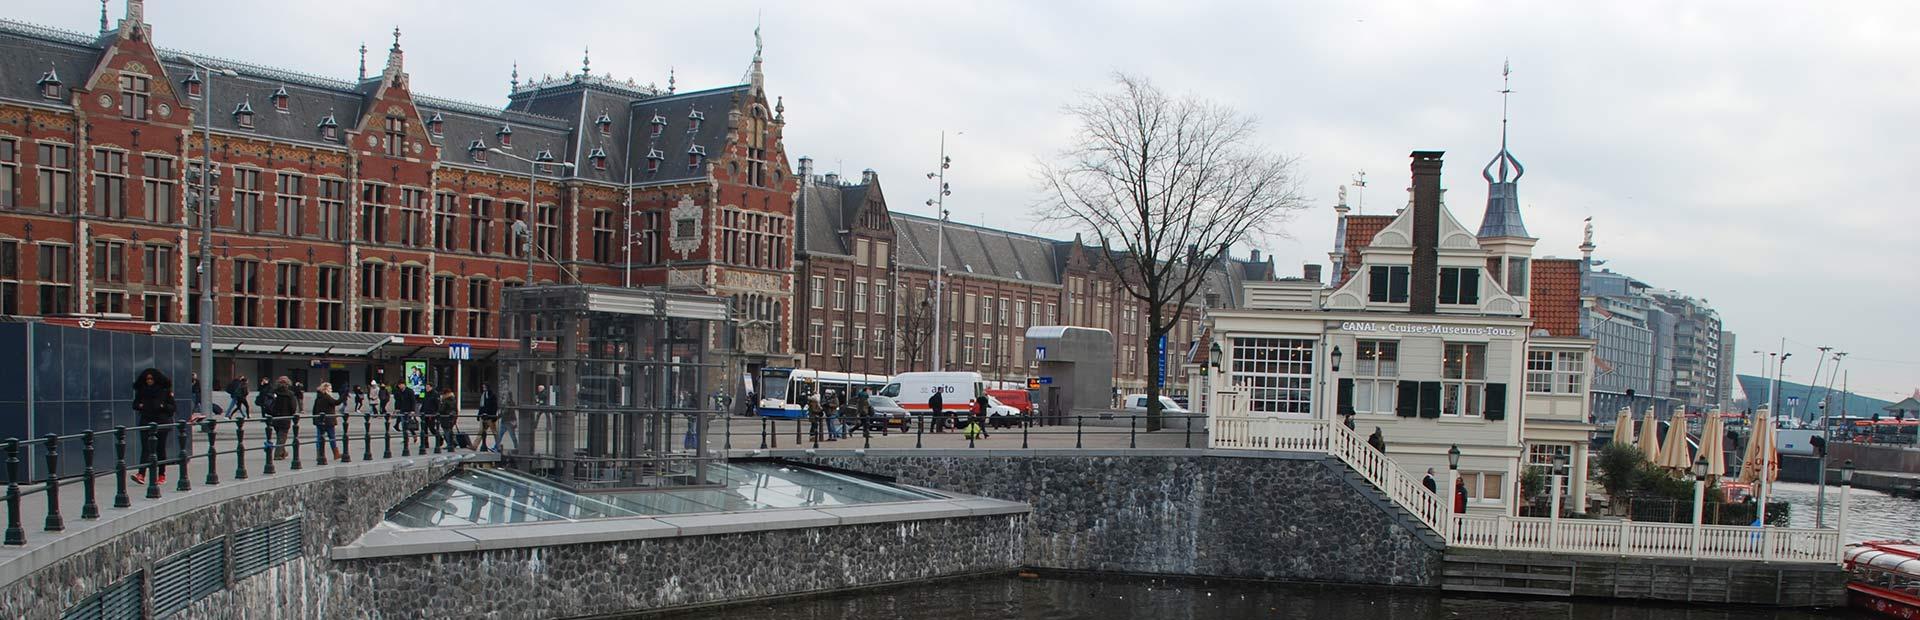 Vide CS Amsterdam